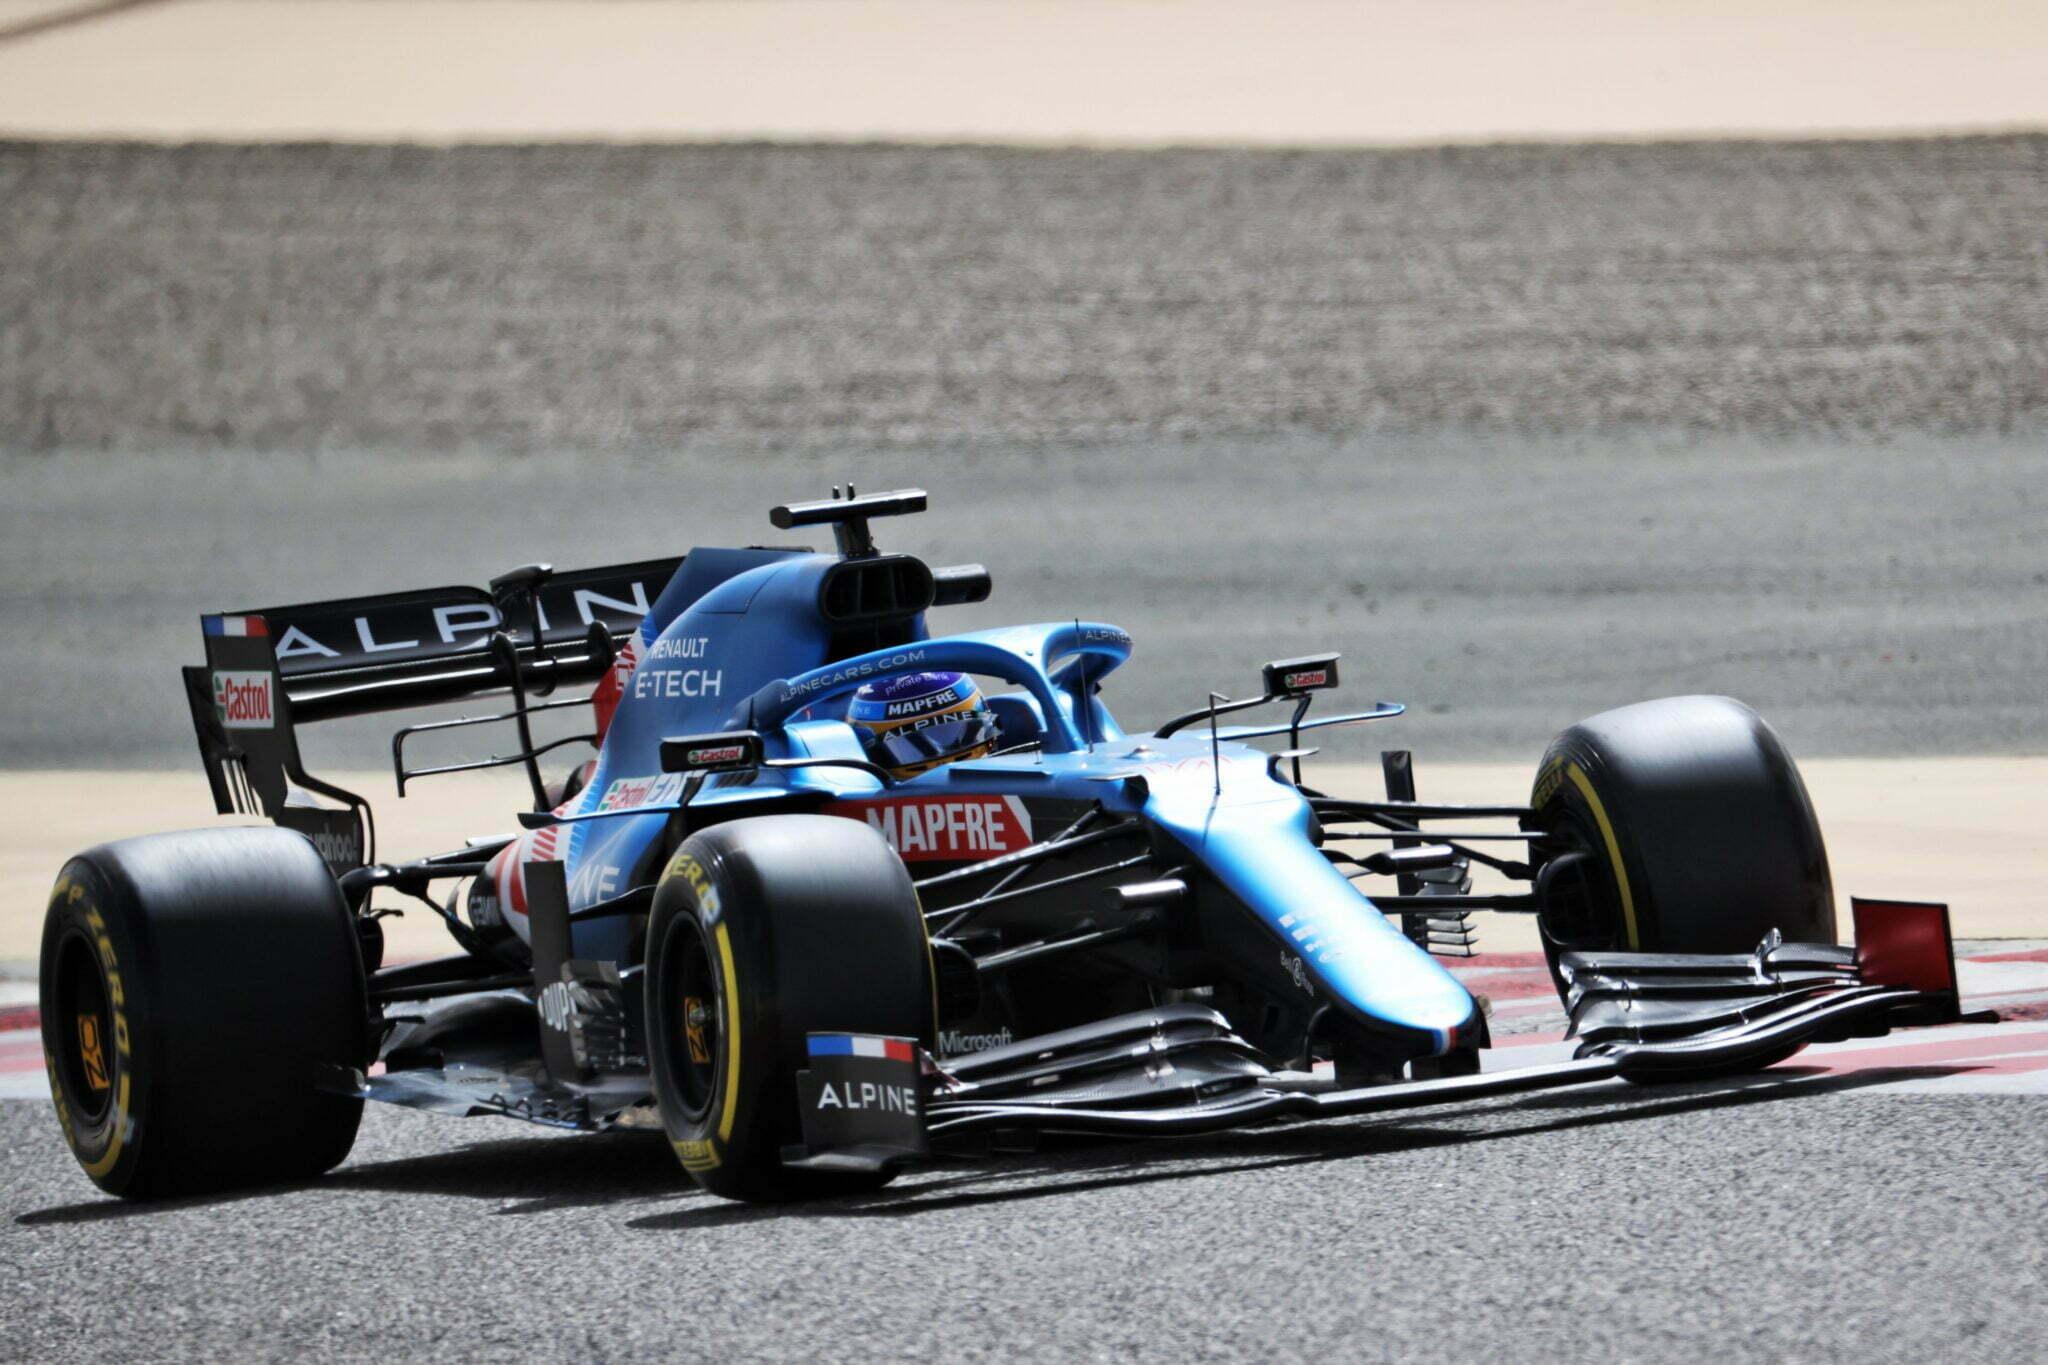 Alpine F1 Team A521 Bahrein test 2 Fernando Alonso 2 | Luca De Meo souhaite qu'Alpine reste en F1 ad vitam aeternam